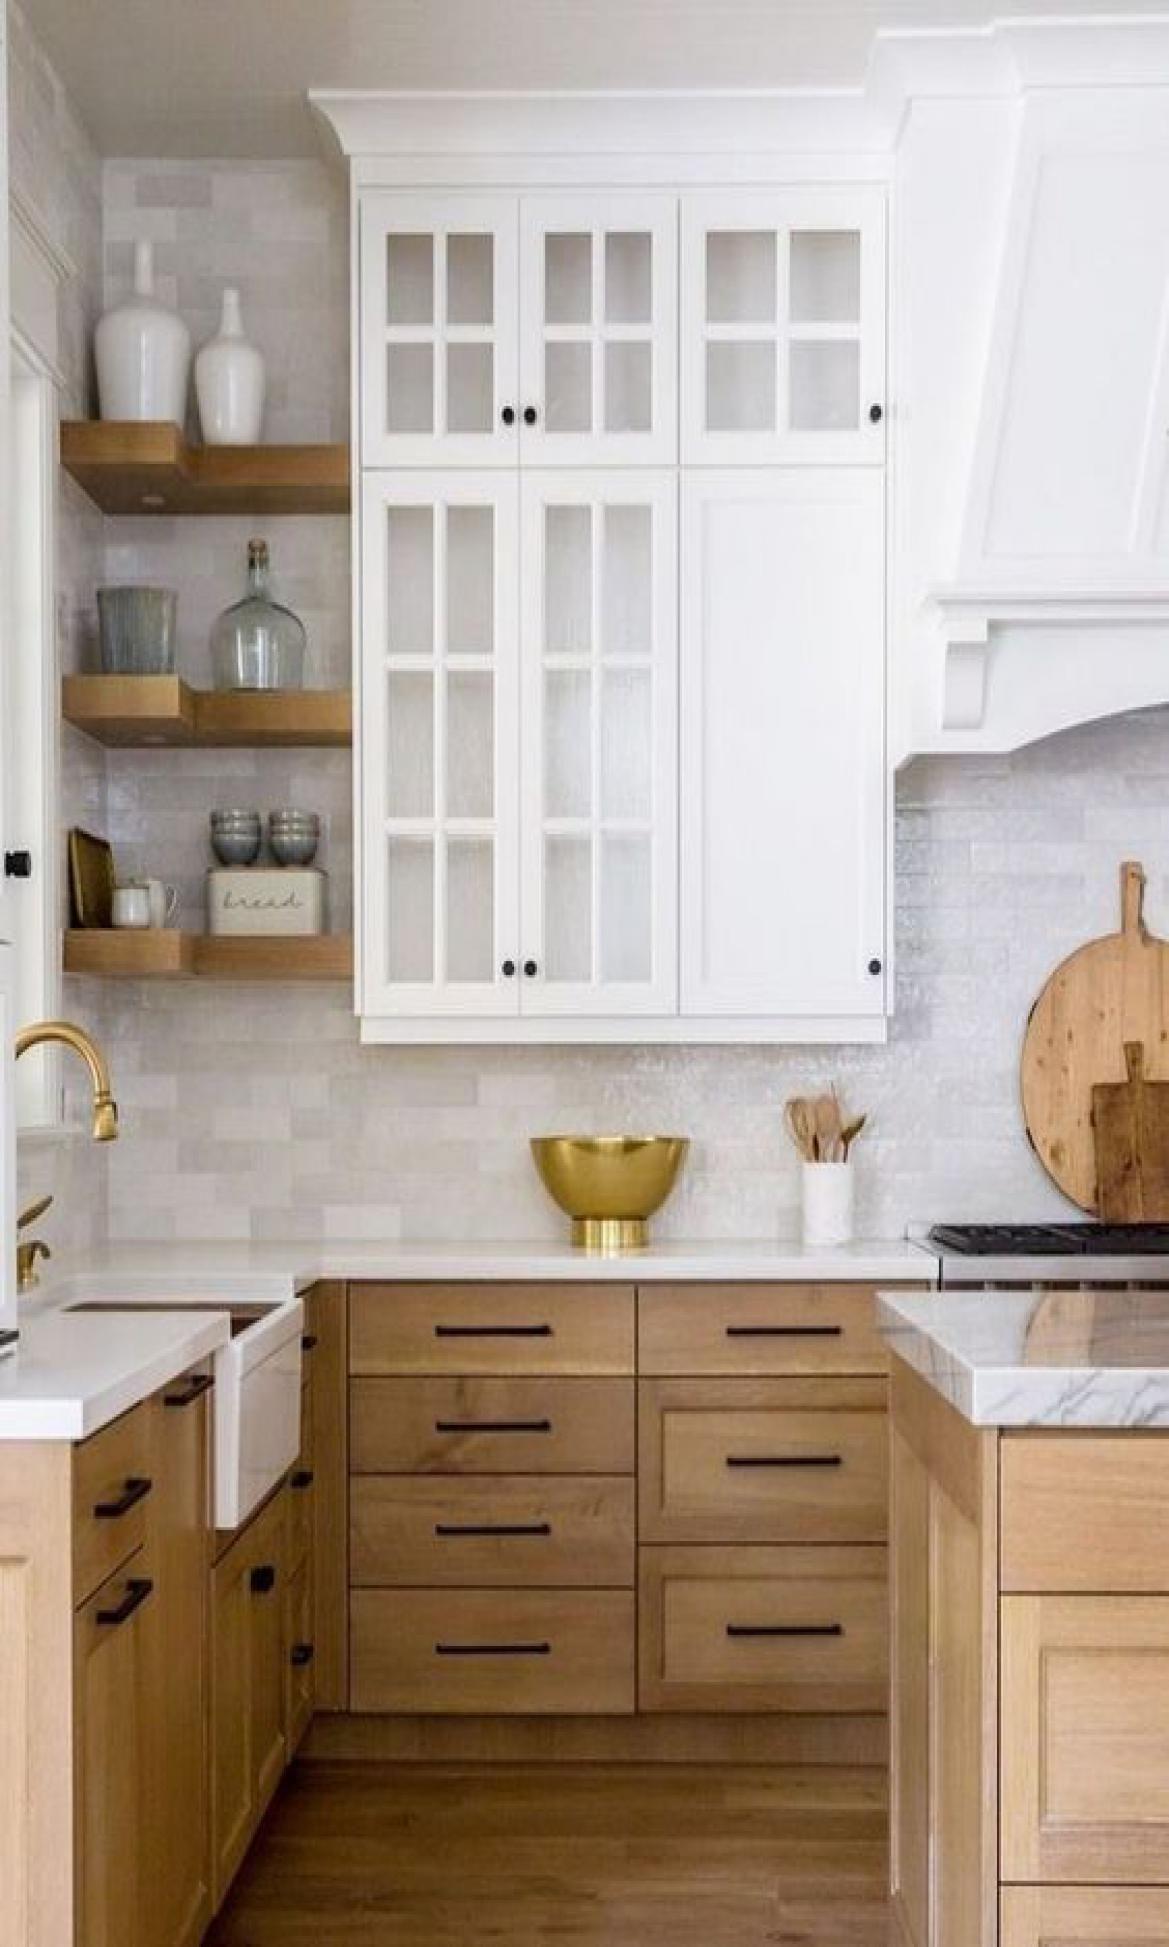 Tlc Grace Sunset Kitchenset Gardens Catering Lifestyle Blogger Bride Travelgram Happ In 2020 Kitchen Design Marble Countertops Kitchen Home Kitchens